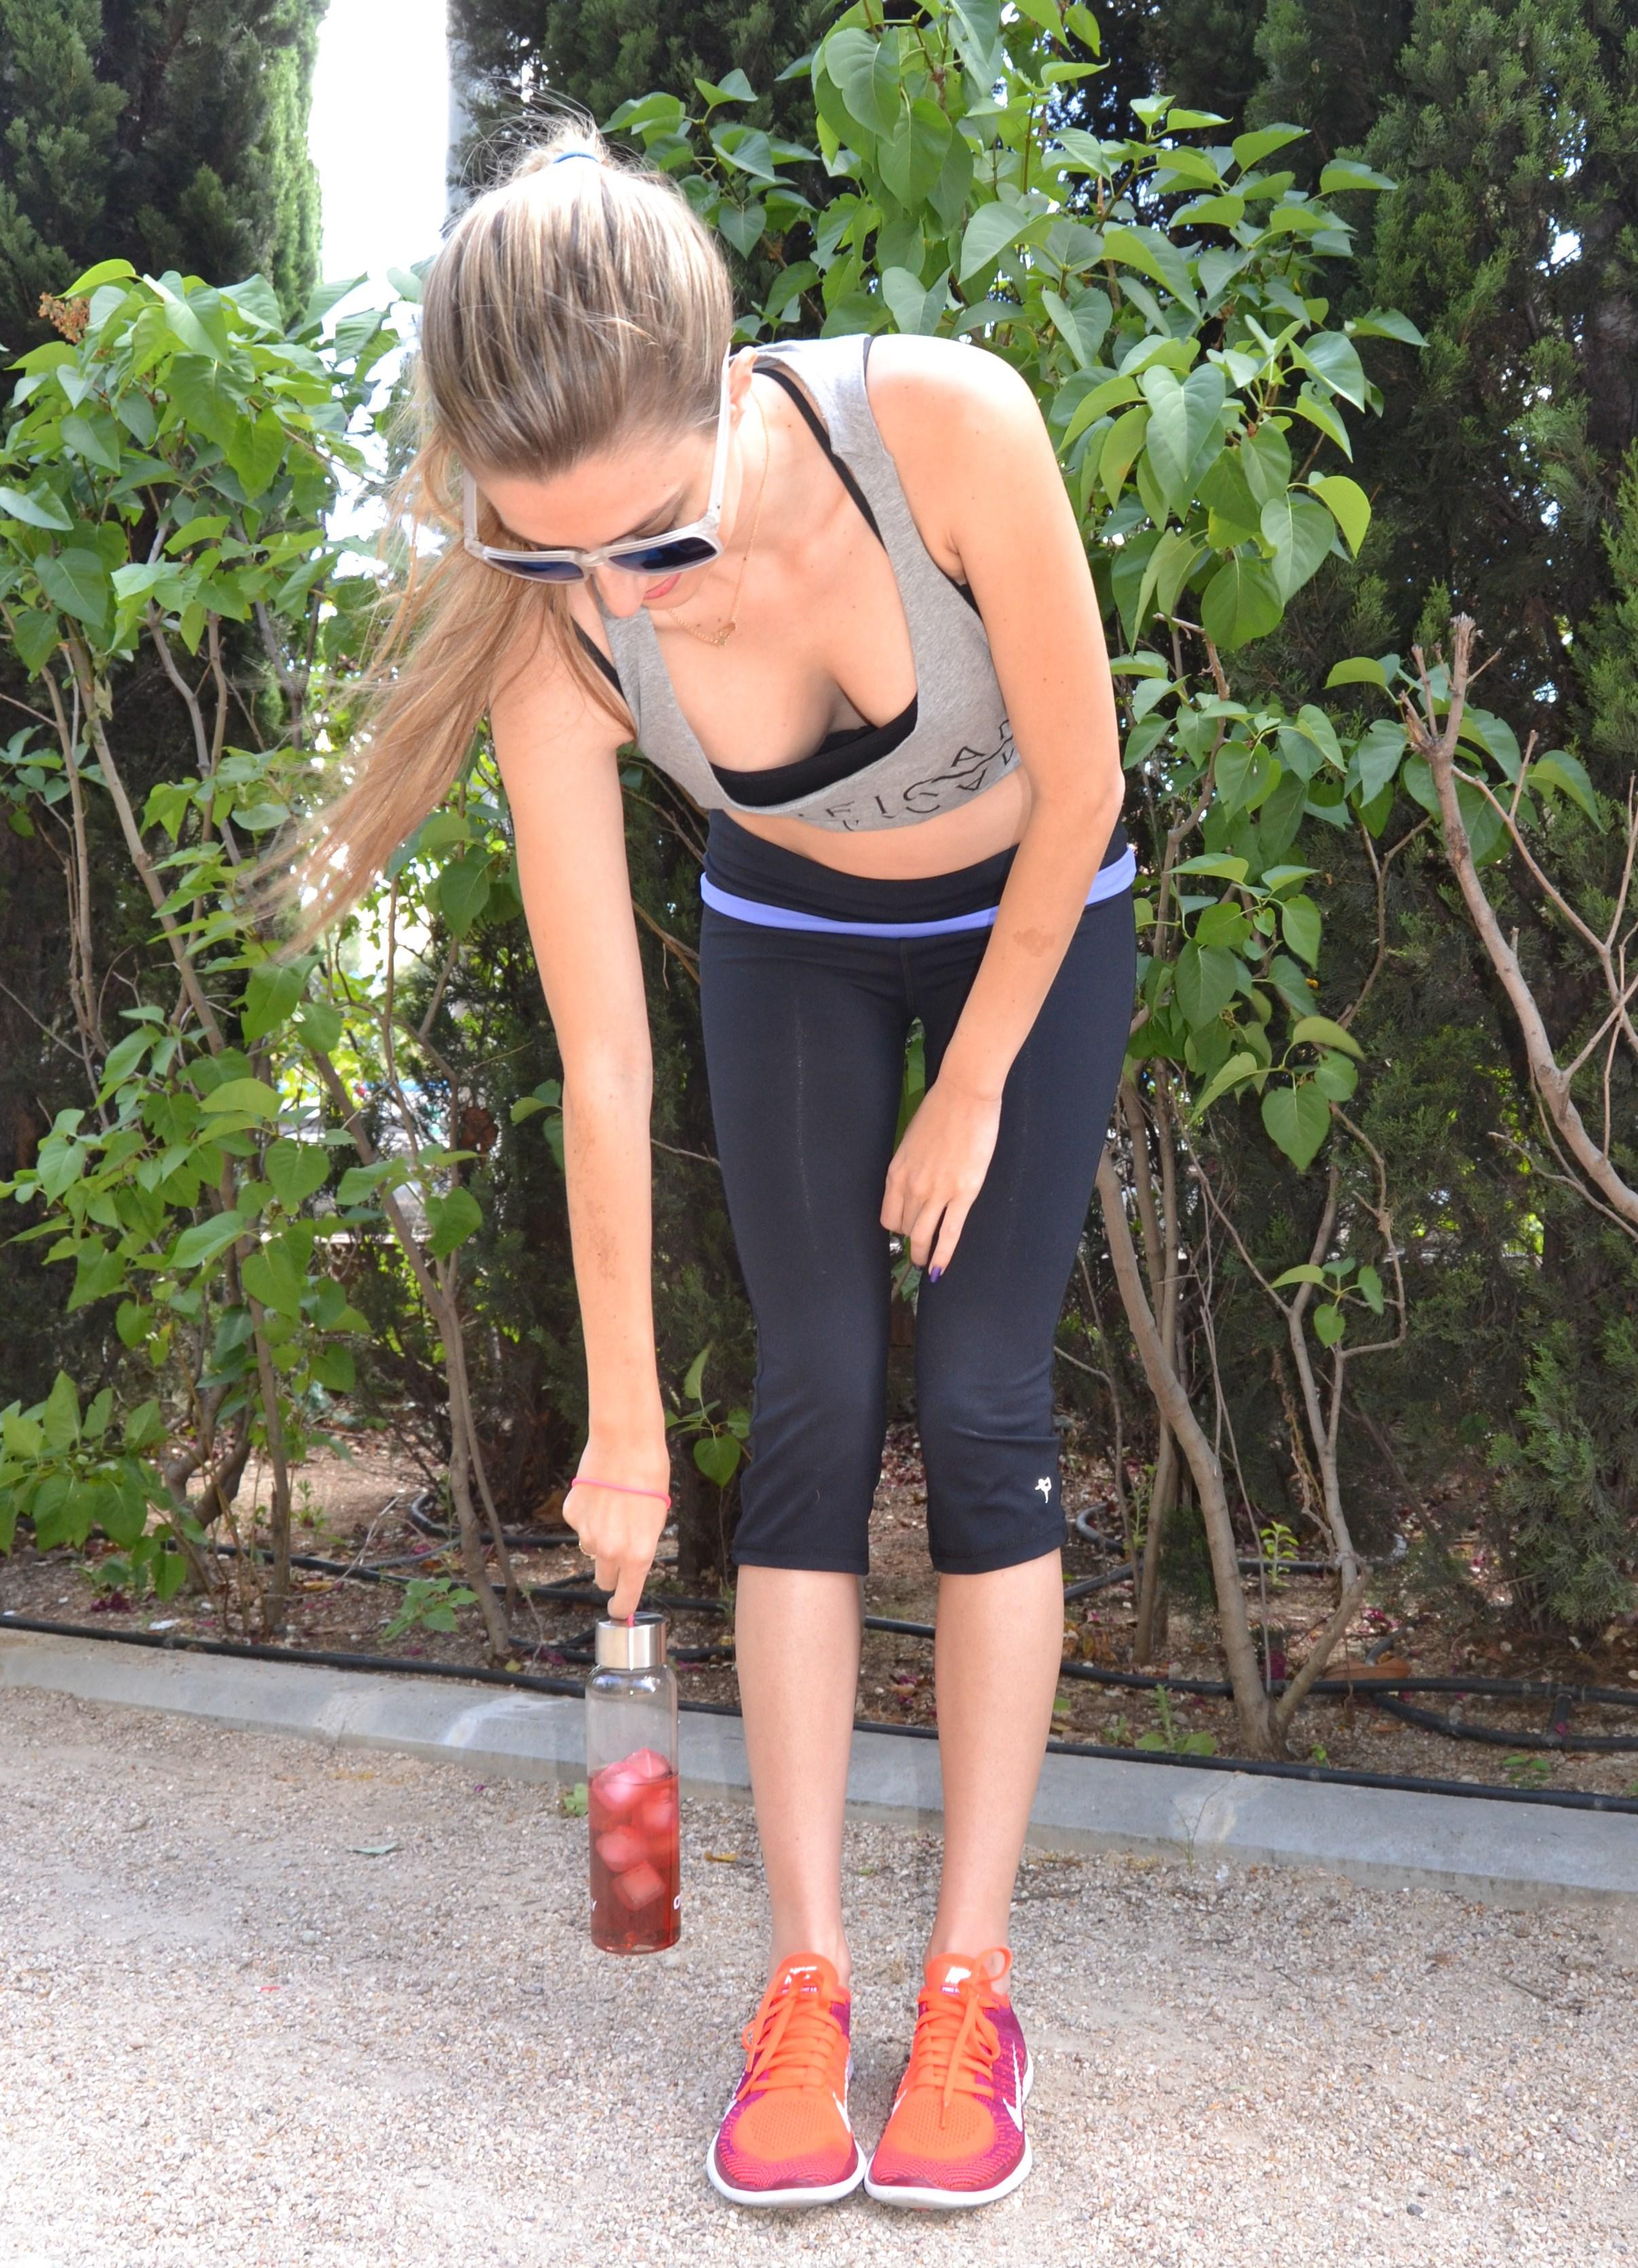 HerbaPremium_Healthy_Life_Sporty_Outfit_Fitness_Nike_Free_Flyknit_Mirror_Sunnies_Lara_Martin_Gilarranz_Bymyheels (12)